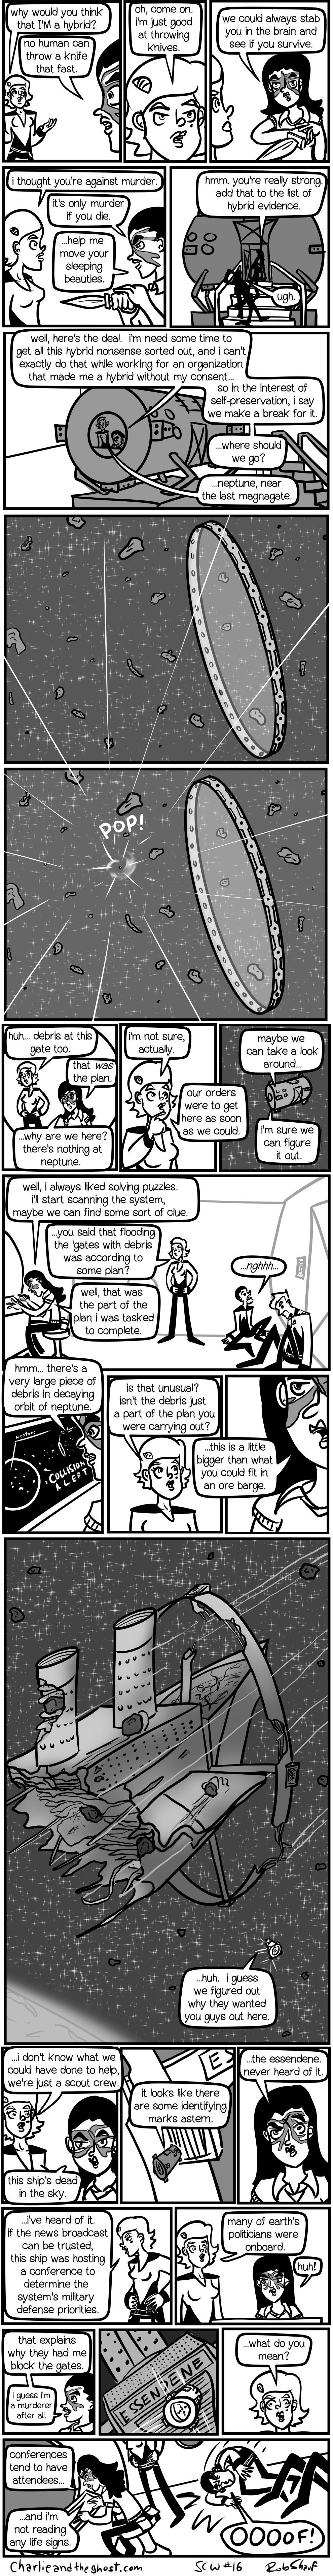 Spacechuck web 16